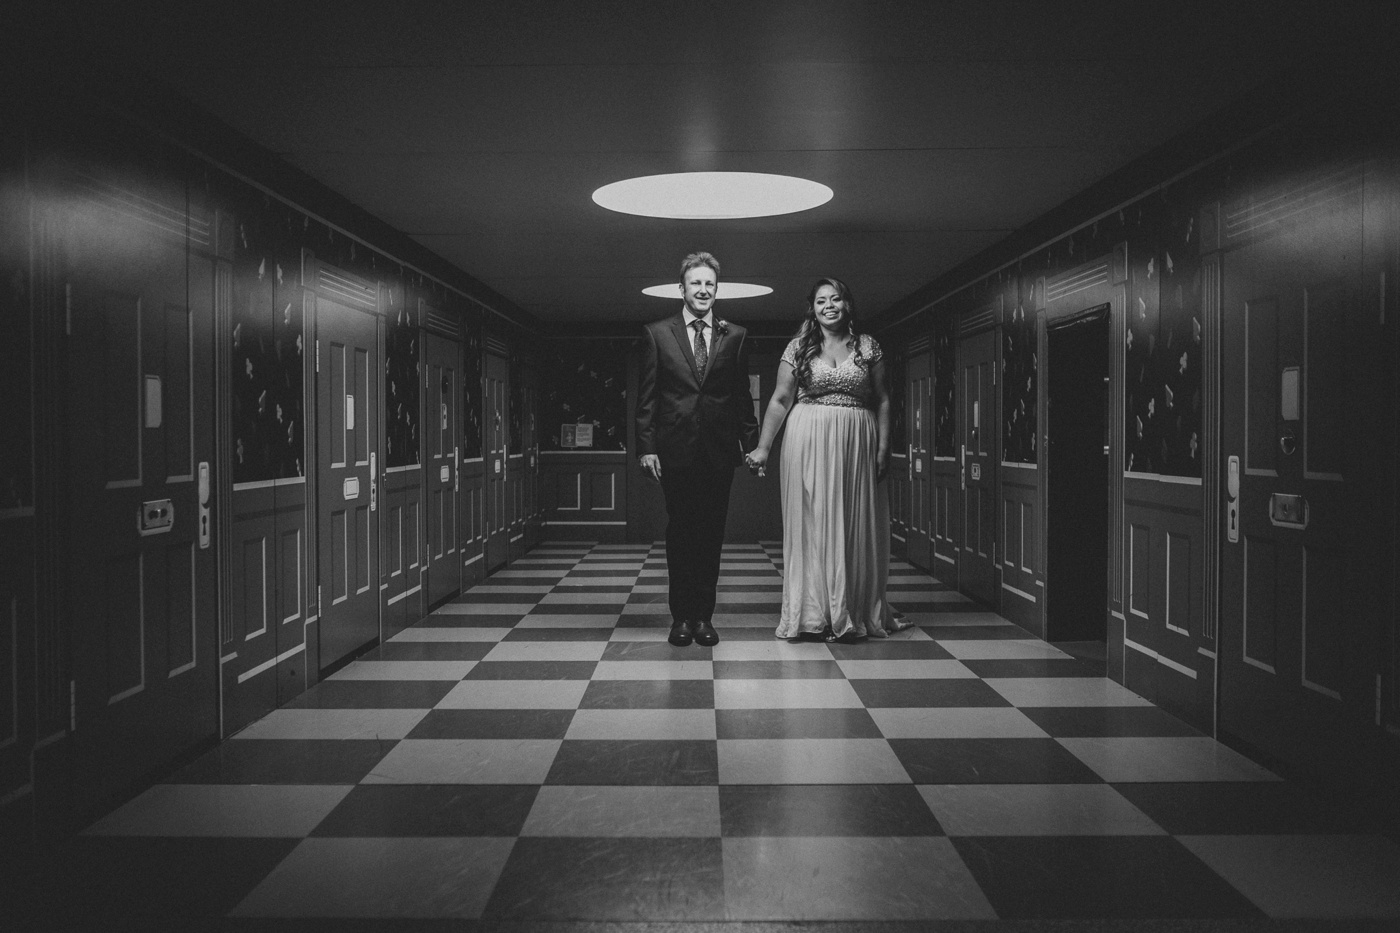 anitadaniel_melbourne-scienceworks-relaxed-fun-geek-wedding_melbourne-candid-wedding-photography_59